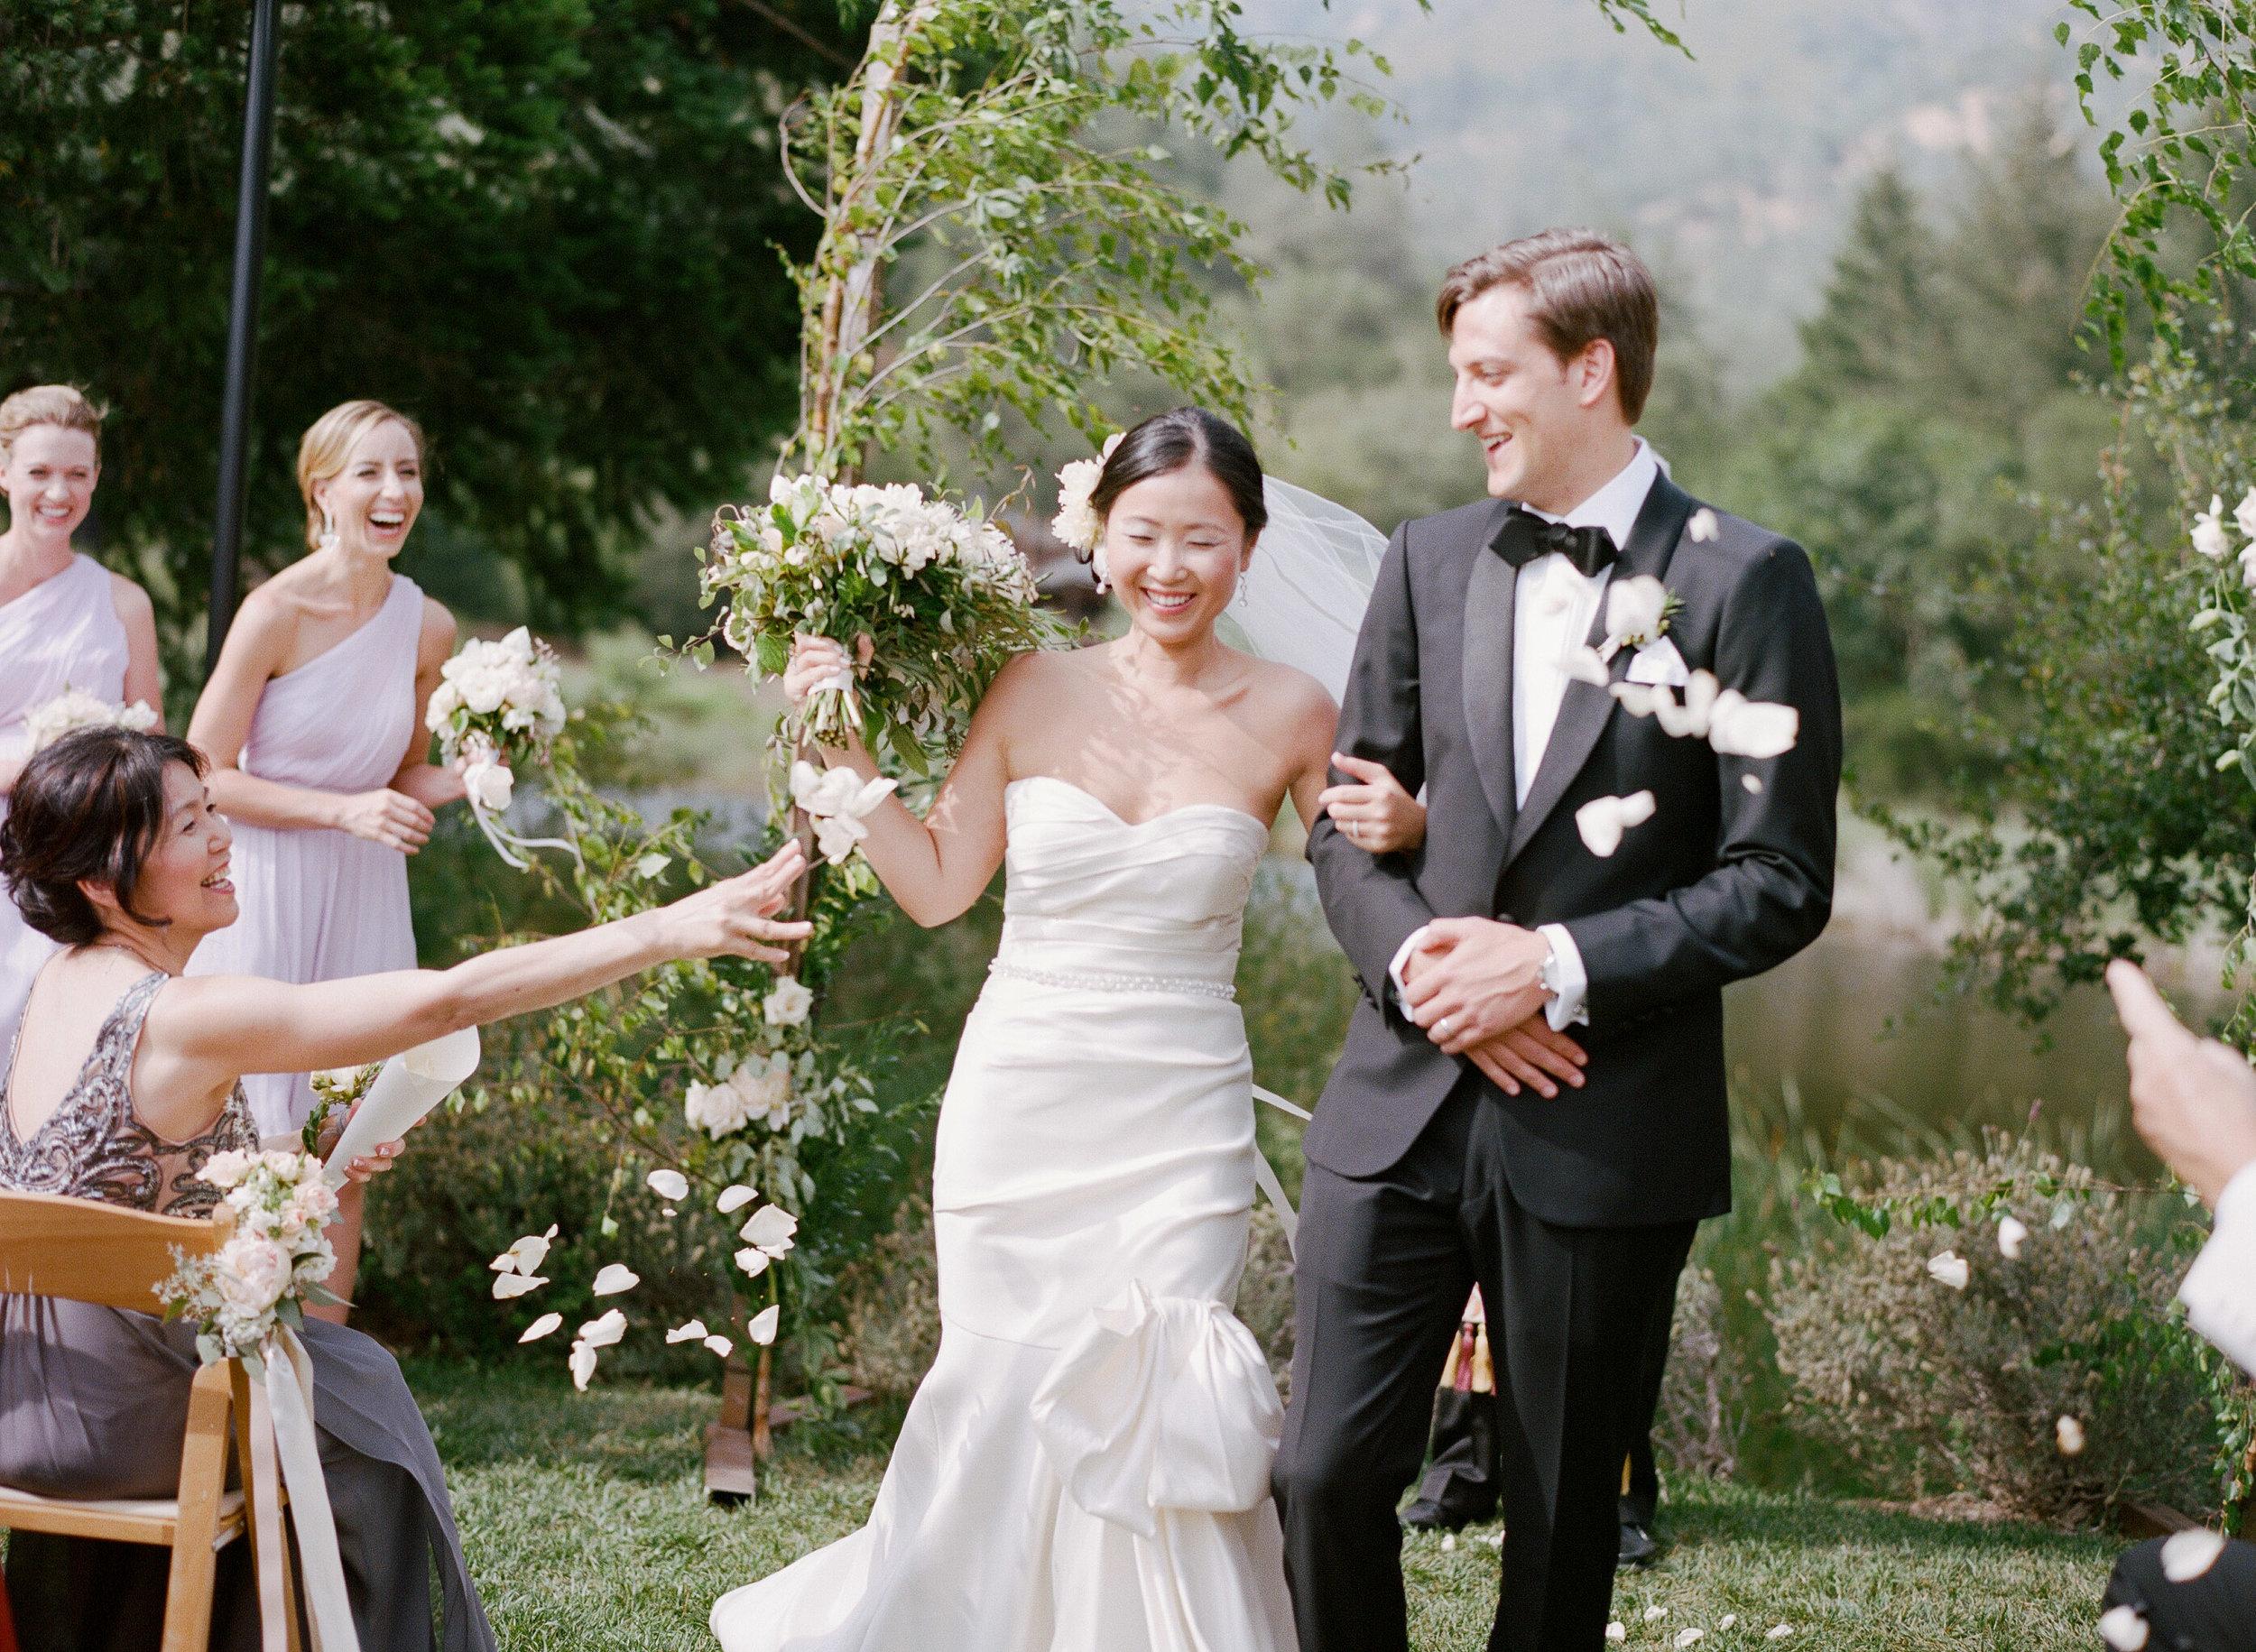 Sylvie-Gil-film-destination-wedding-photography-di-peter